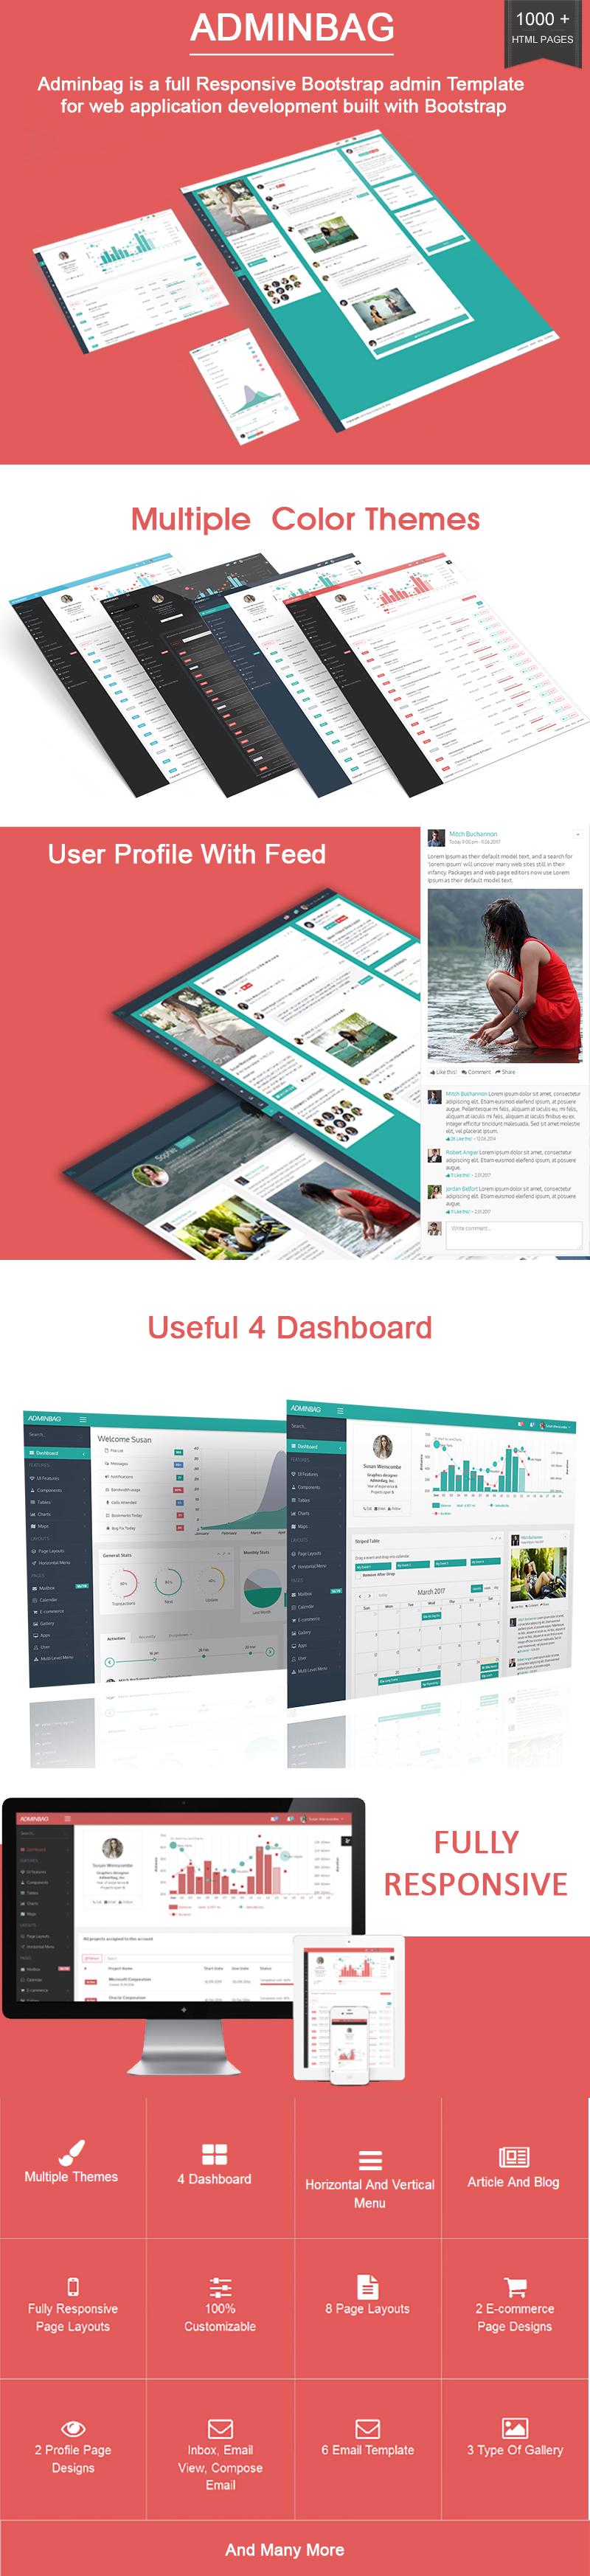 Admin bag - Angular Admin Responsive Template &  Dashboard - 1